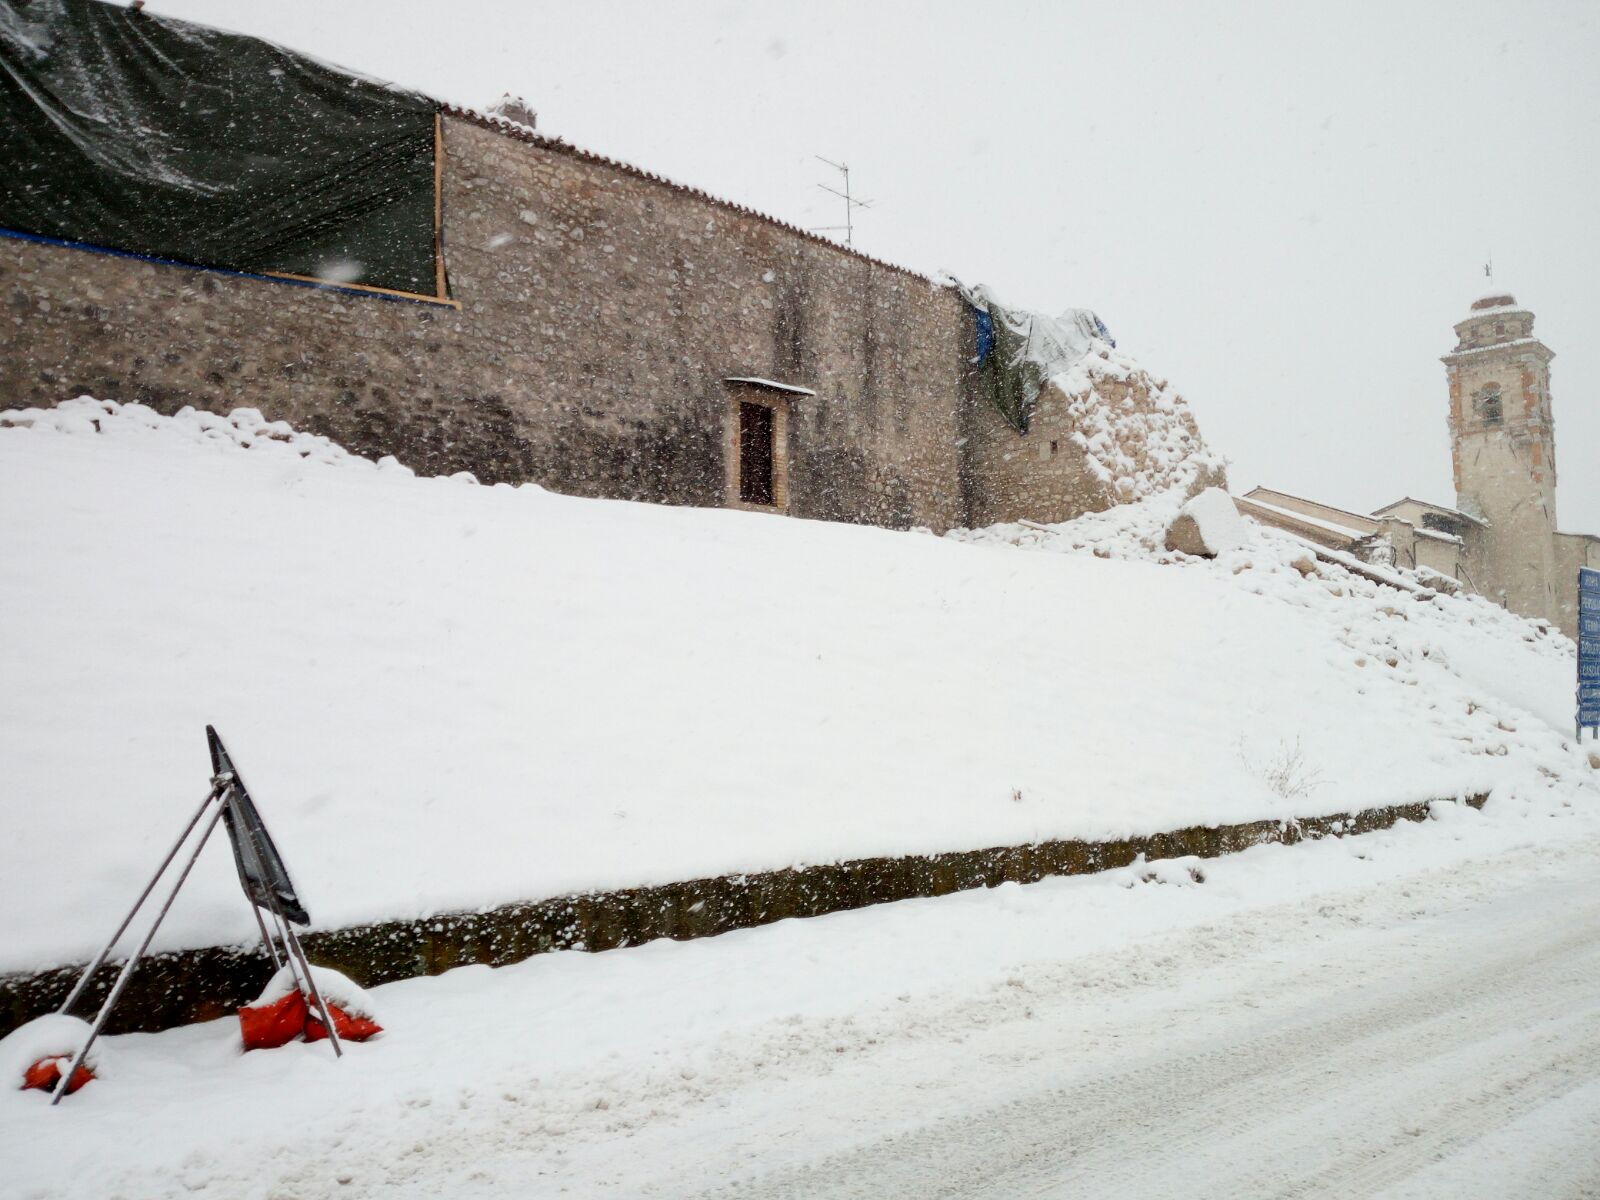 terremoto-norcia-neve-17-gennaio-2017-6